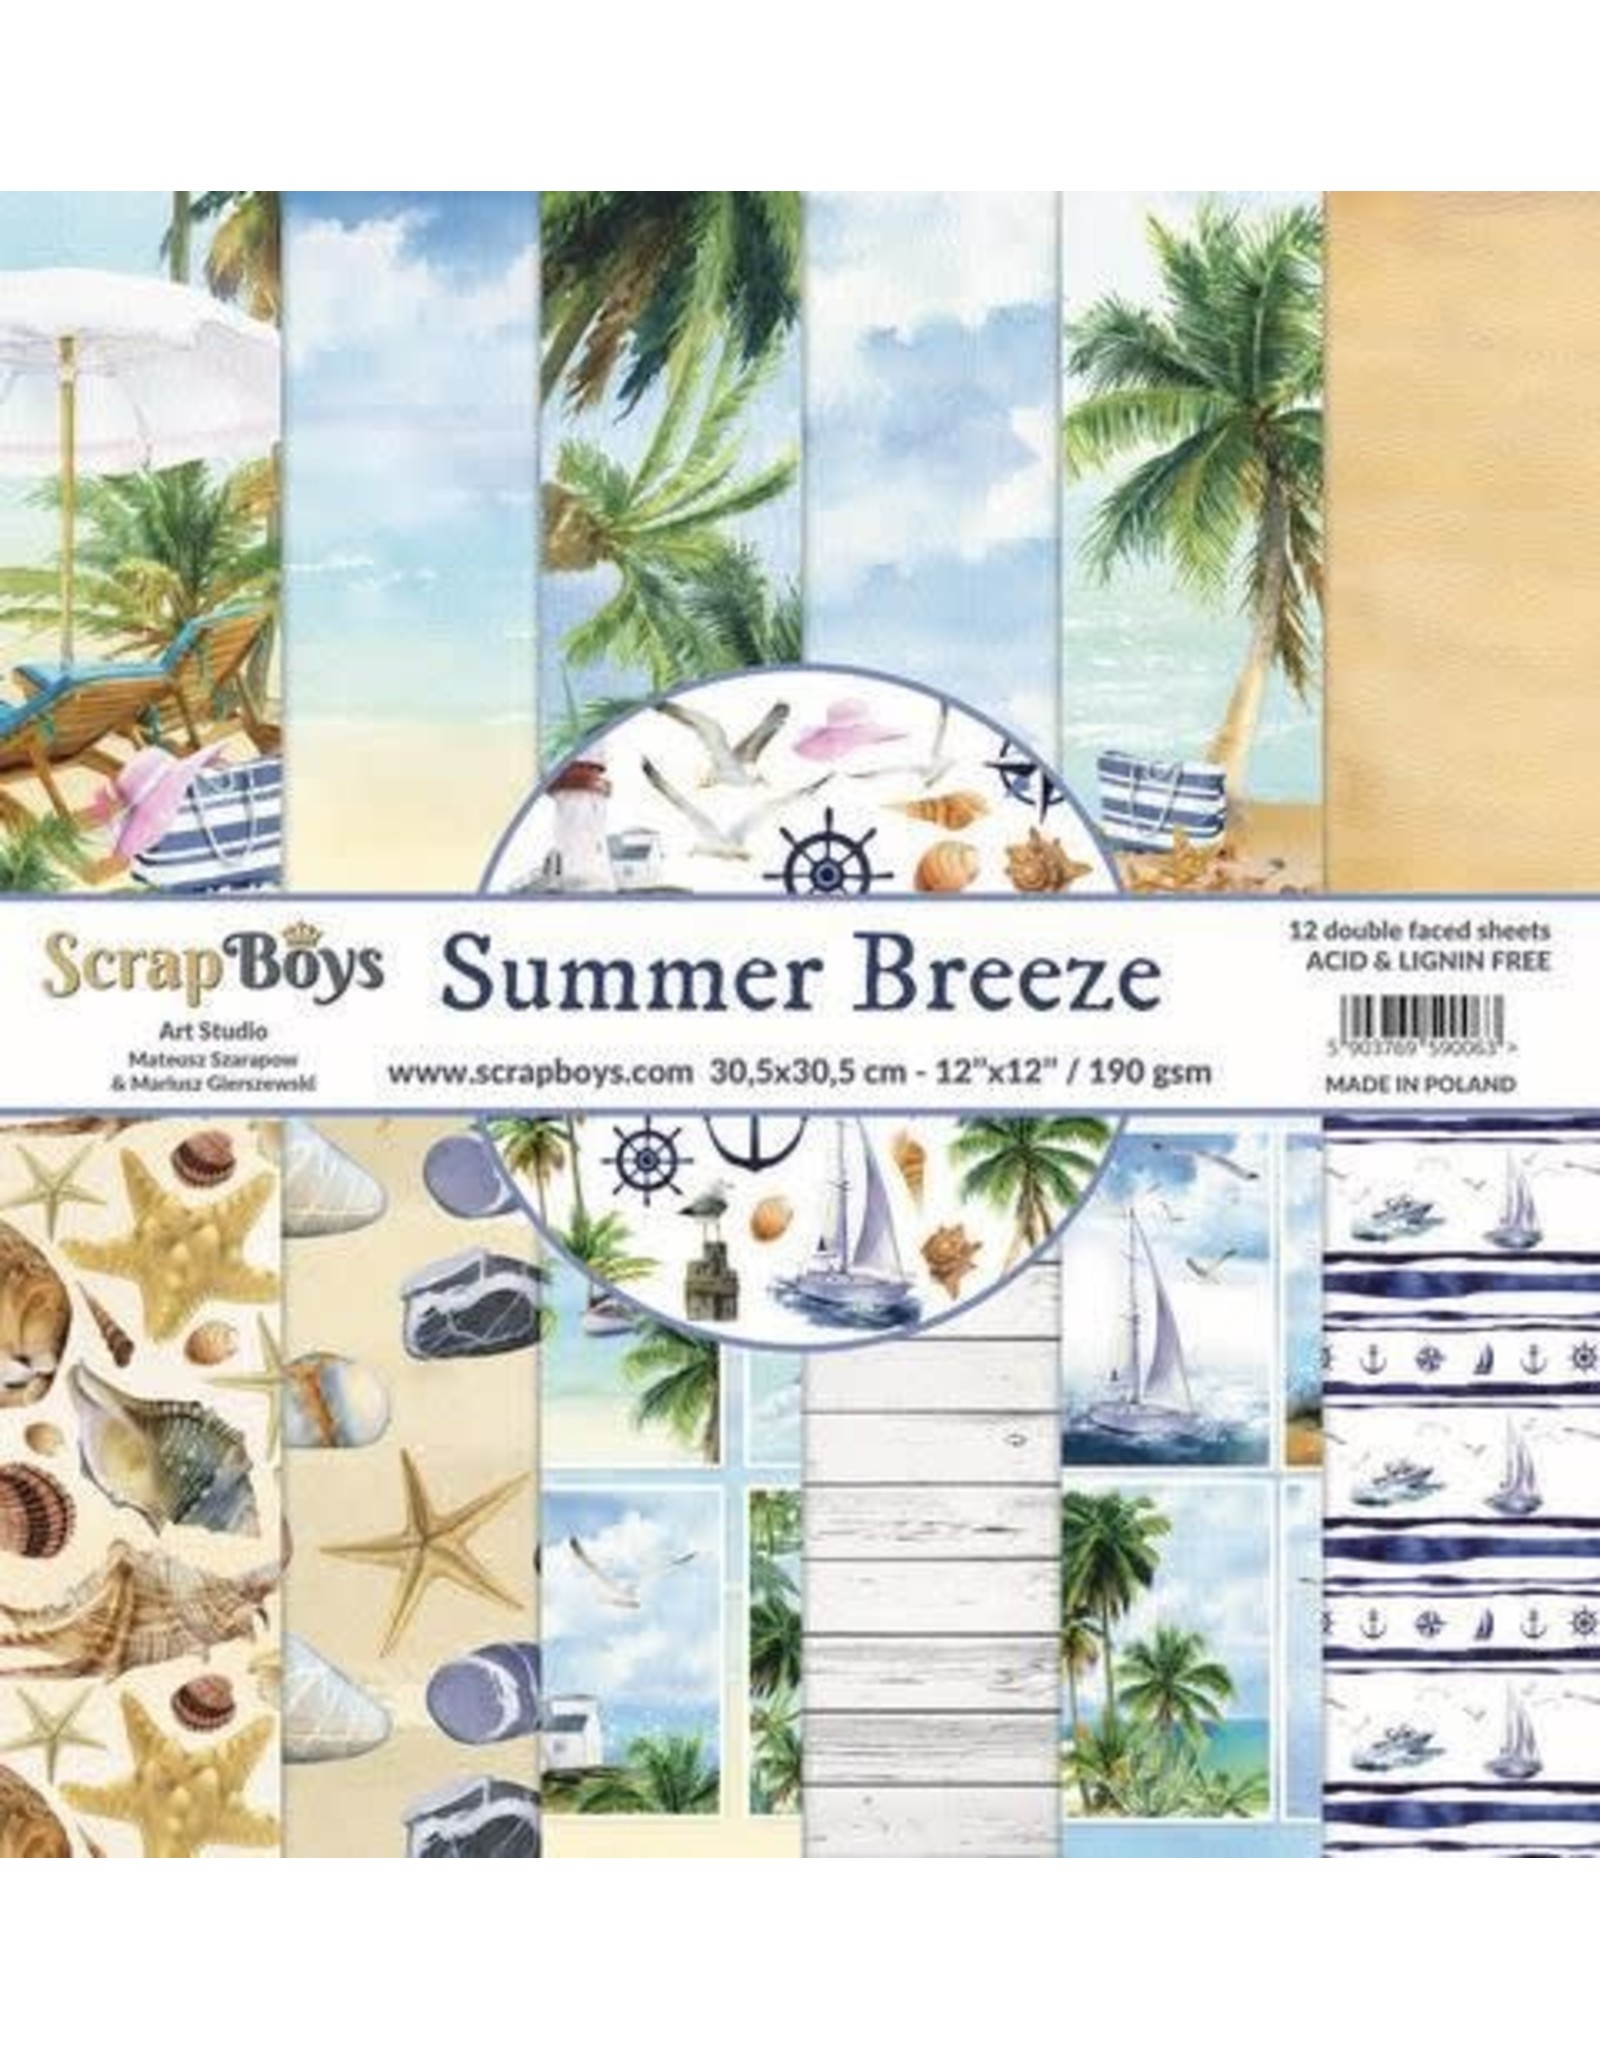 Scrapboys ScrapBoys Summer Breeze paperset 12 vl+cut out elements-DZ SUBR-08 190gr 30,5 x 30,5cm